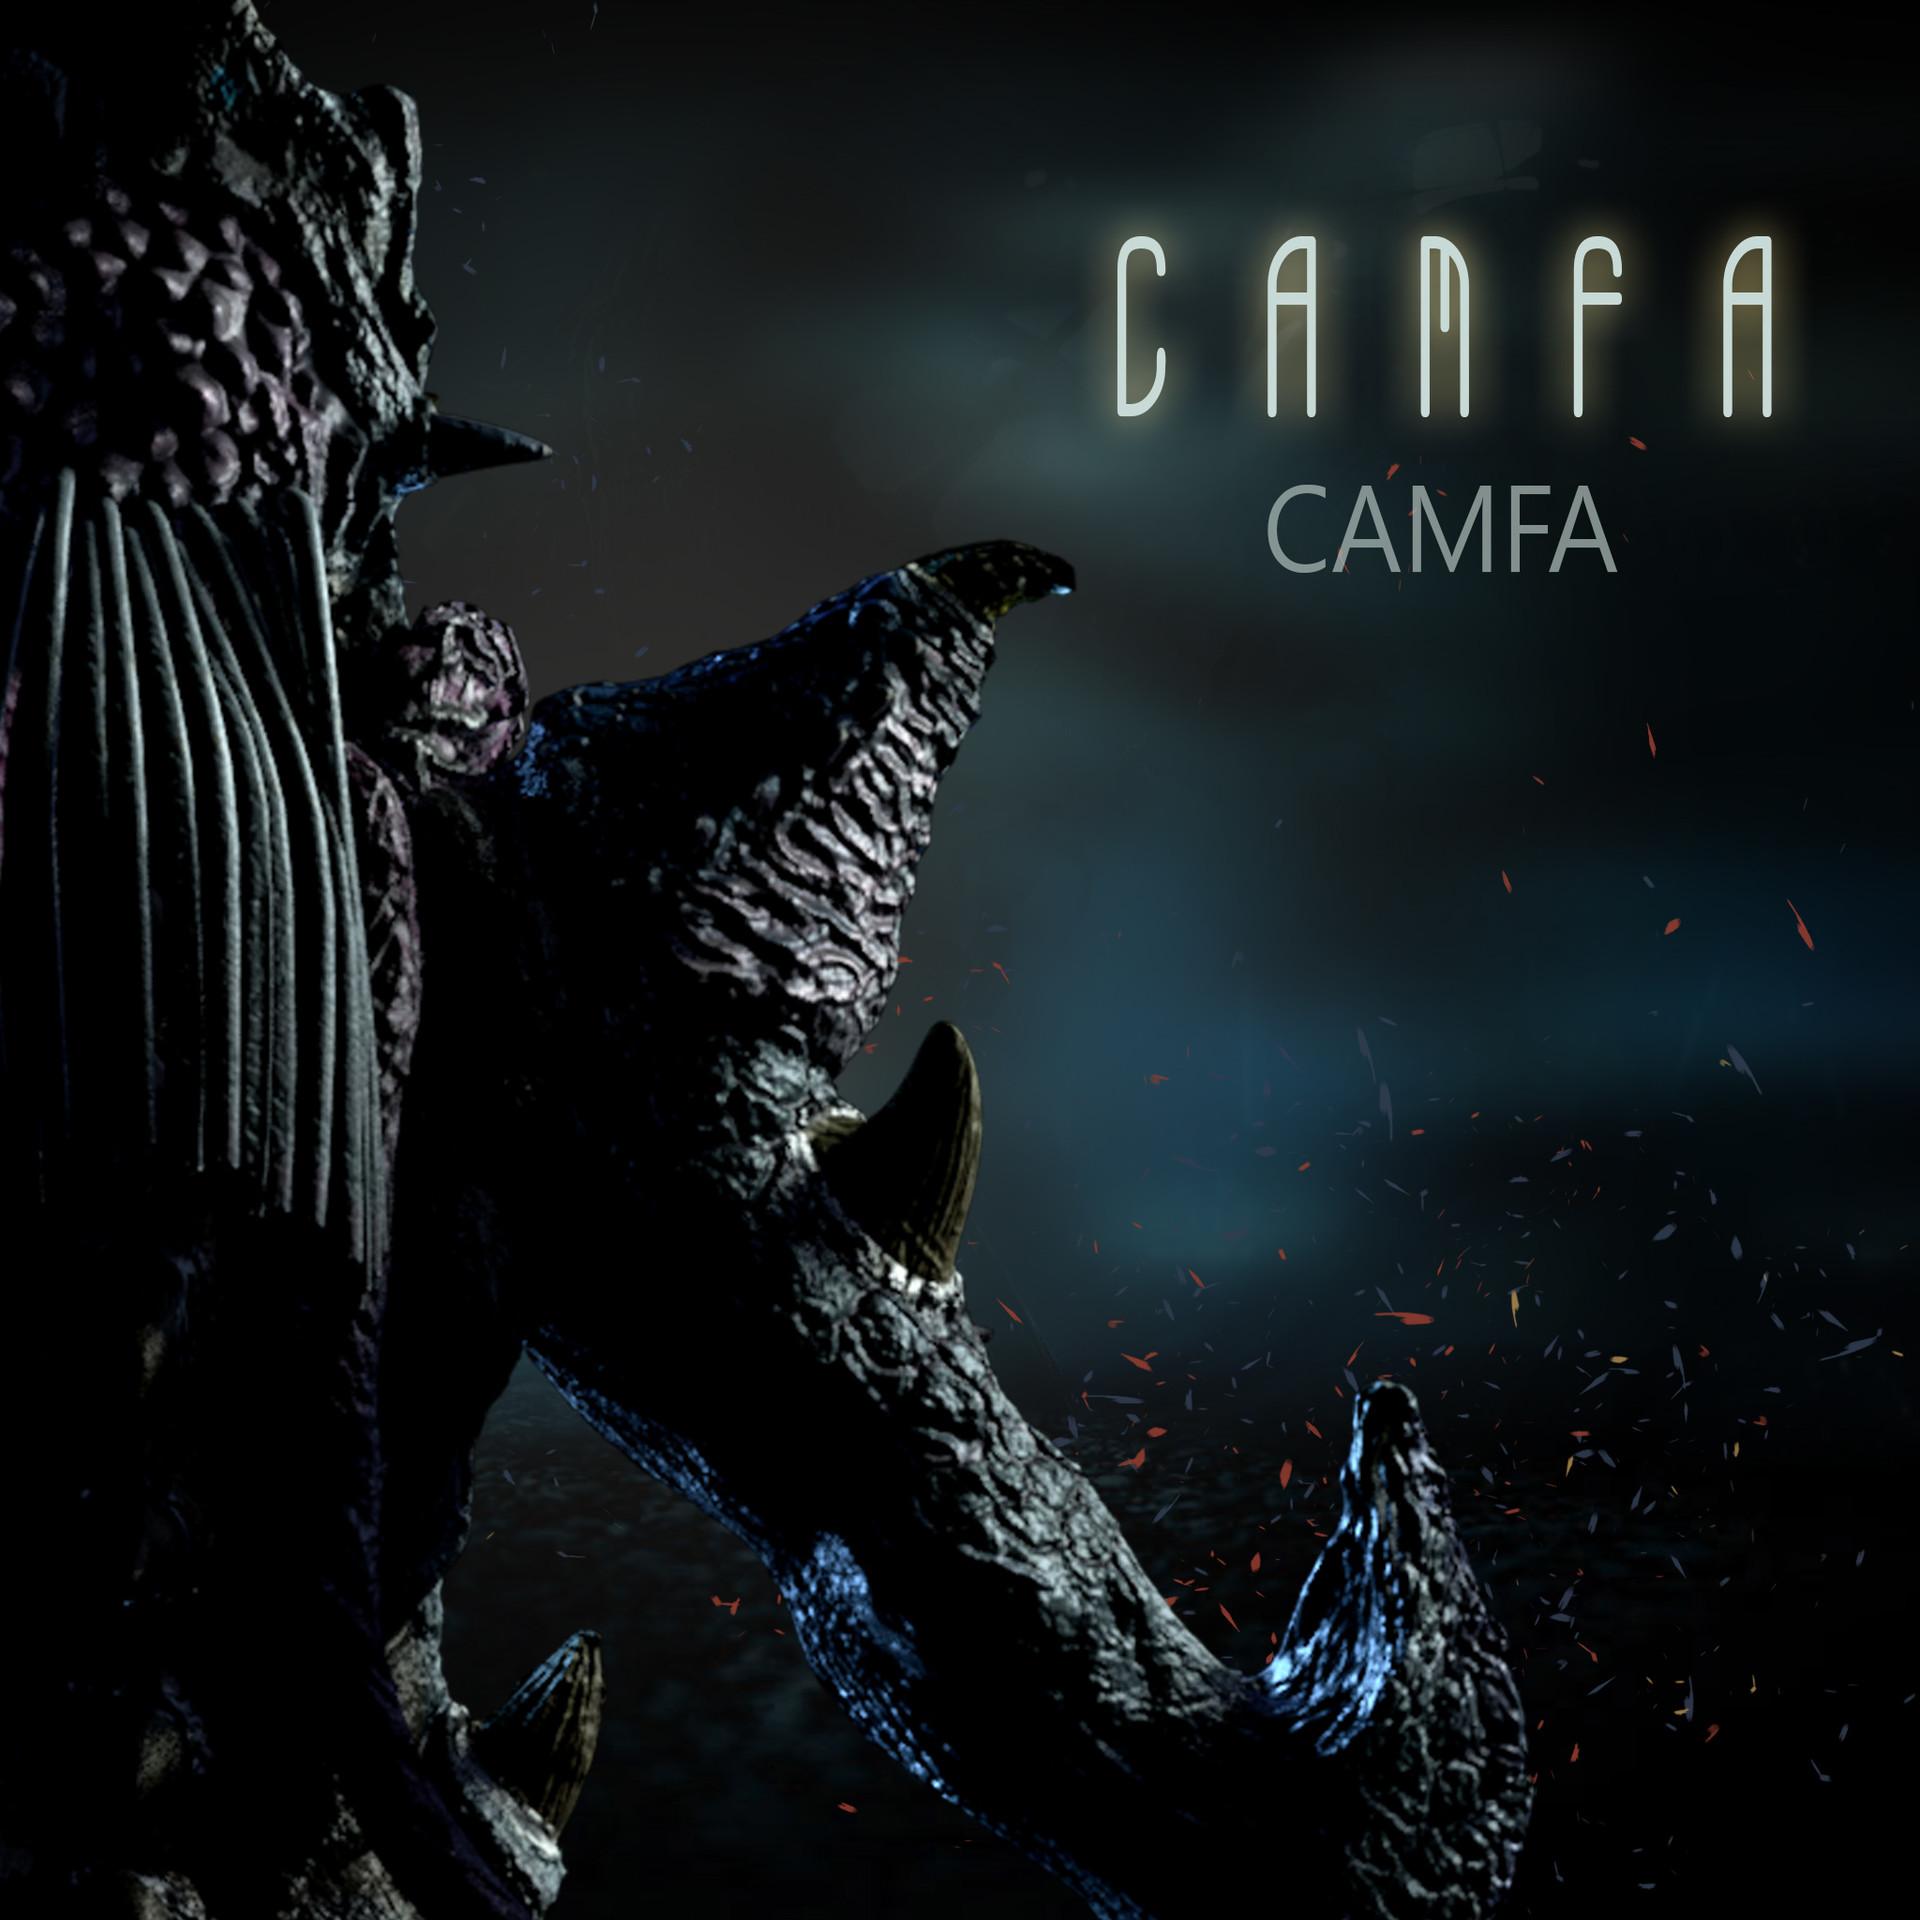 CG monster Camfa